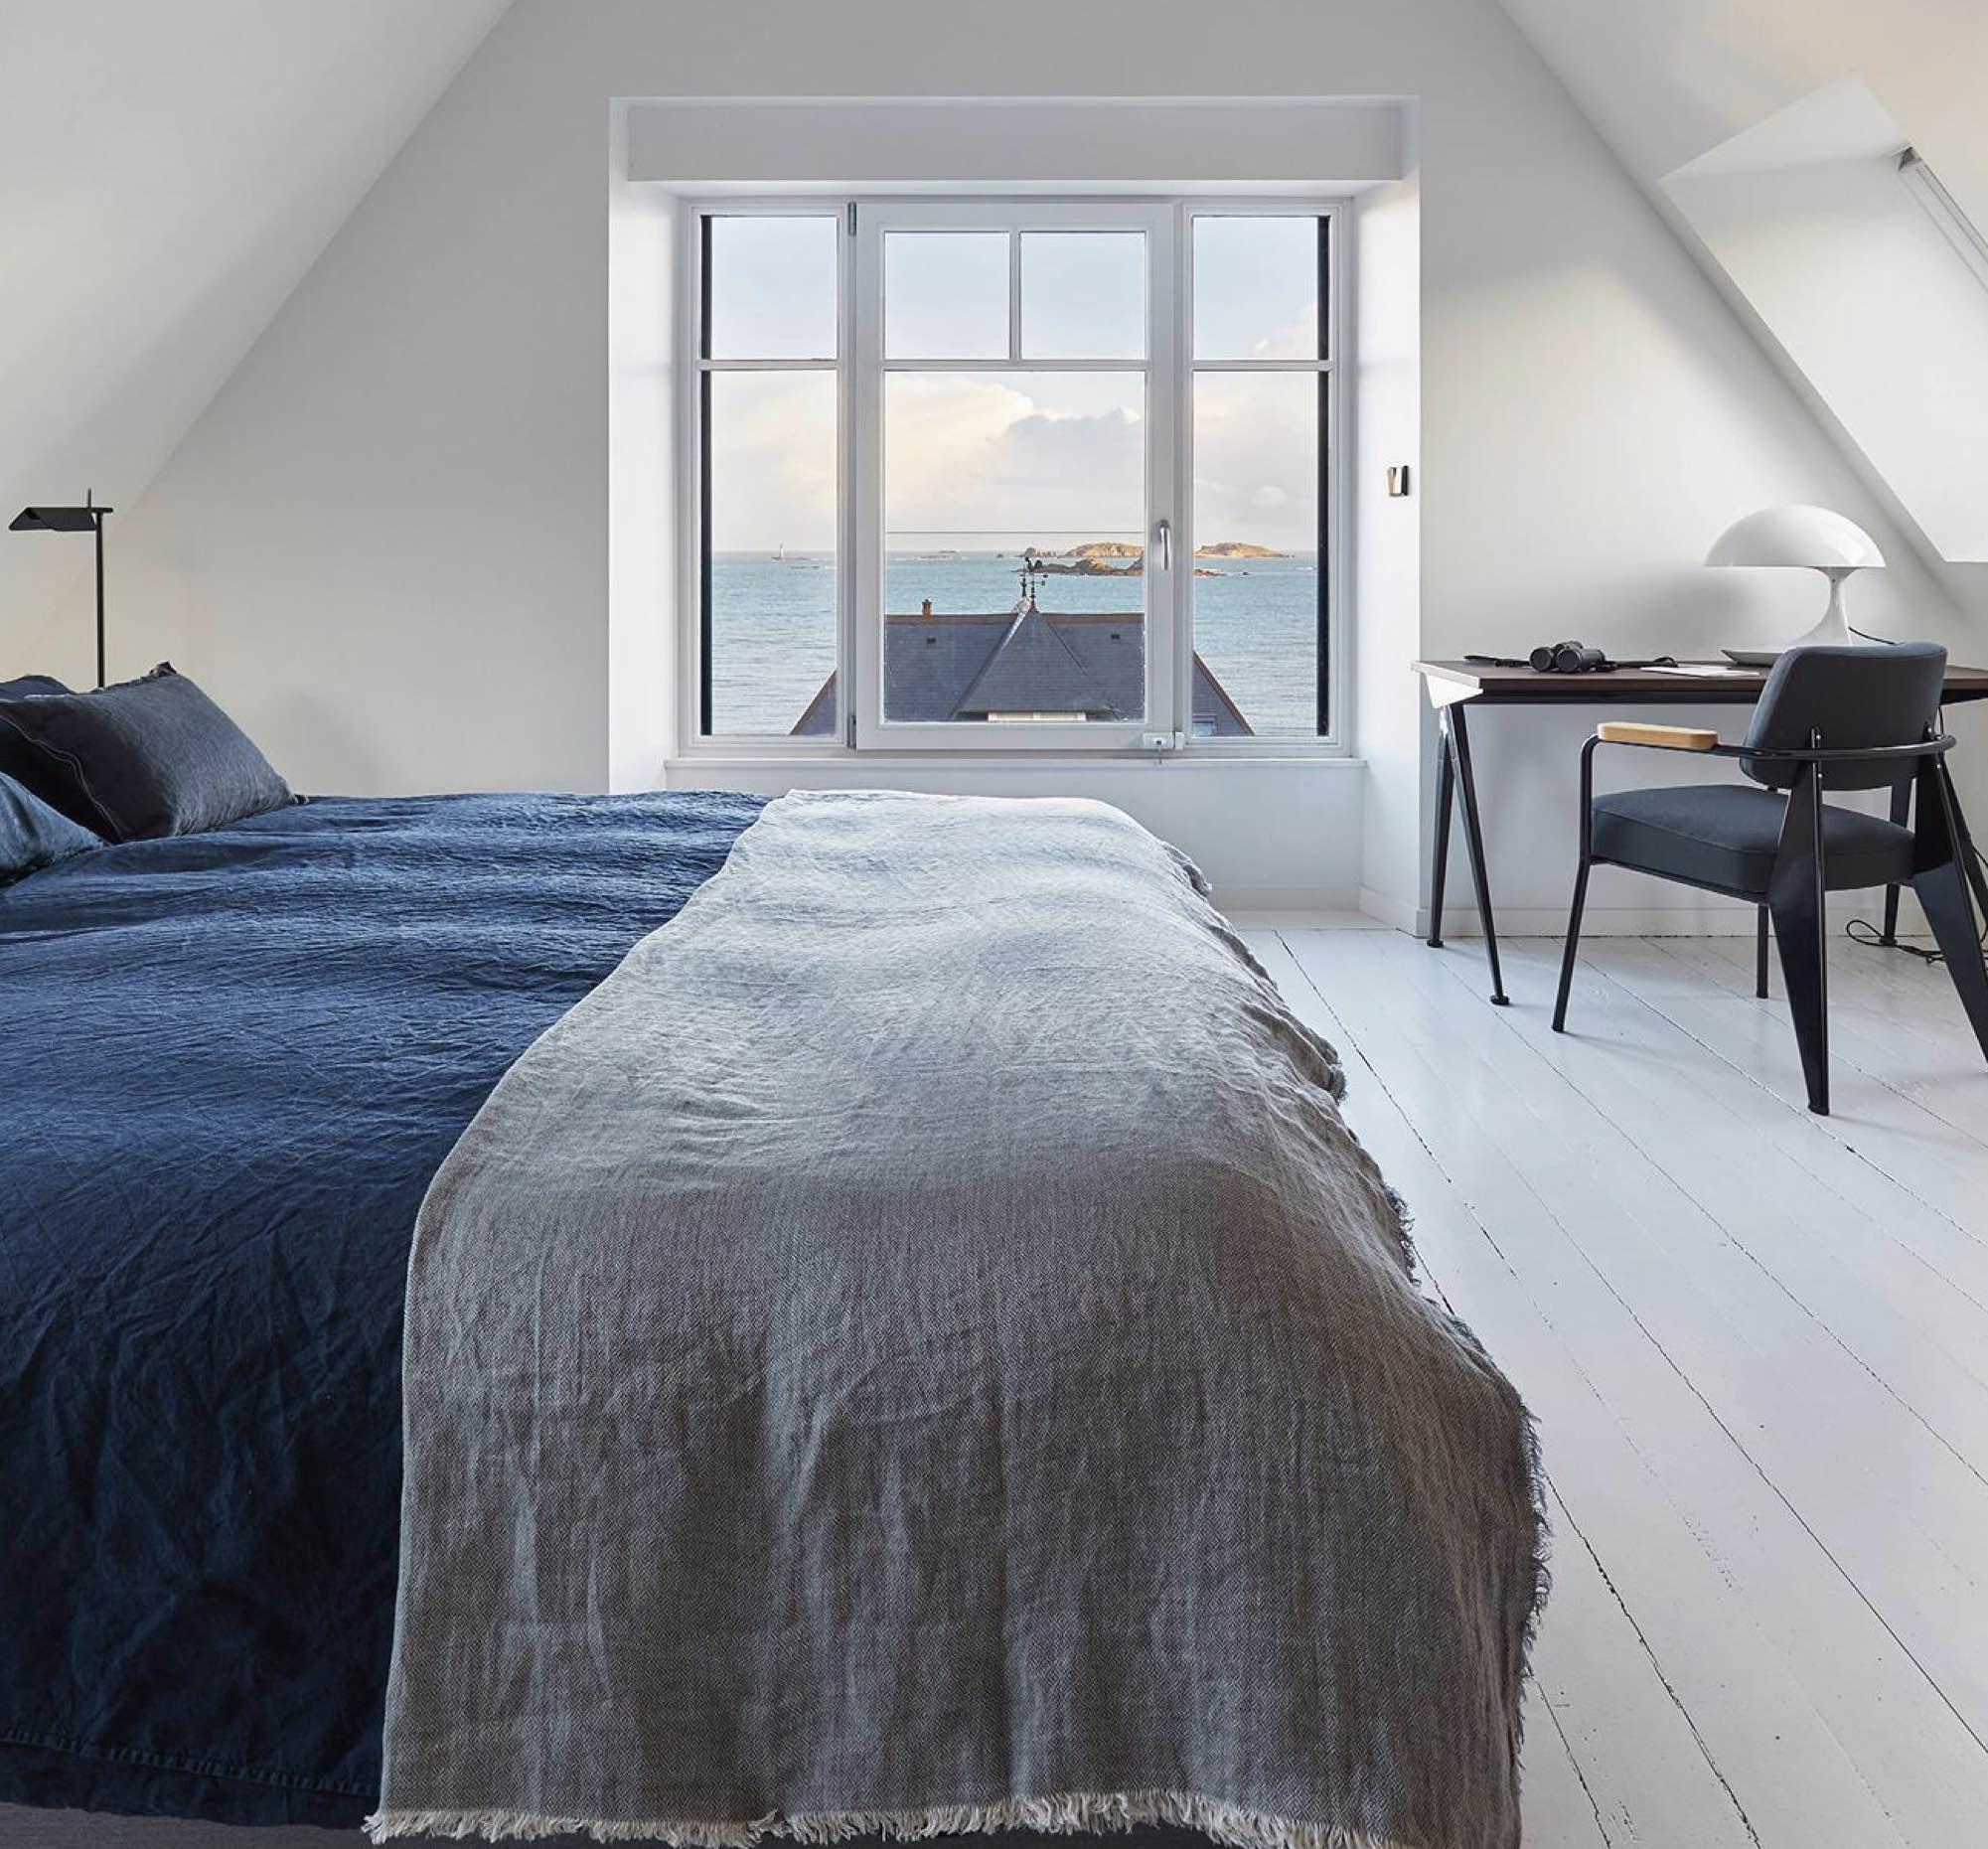 s lection bleu indigo tapis plaid coussin vaisselle la maison g n rale la maison g n rale. Black Bedroom Furniture Sets. Home Design Ideas